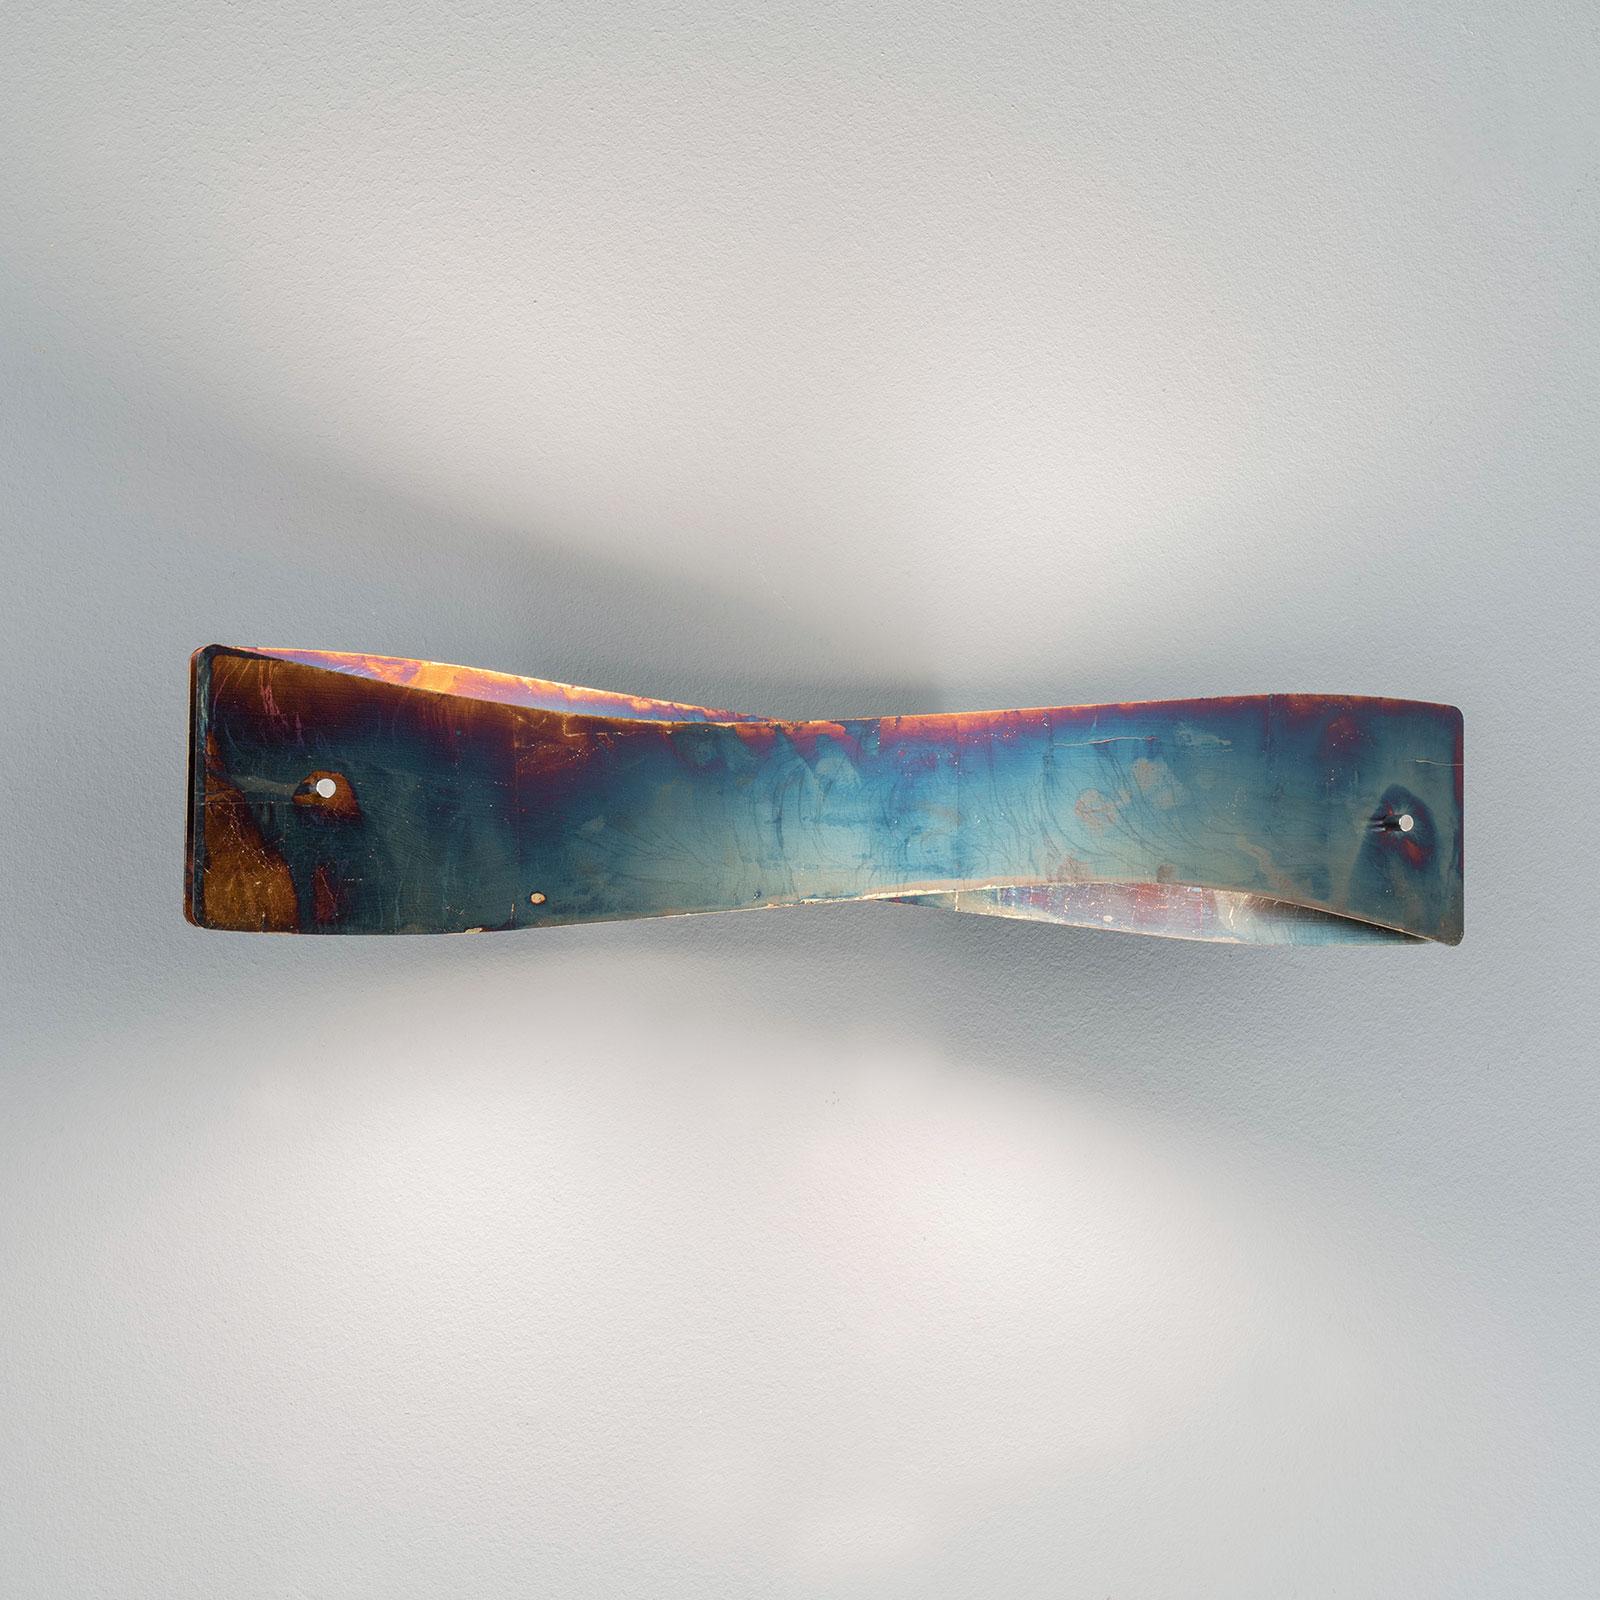 Lucande Lian aplique LED, dorado oxidado